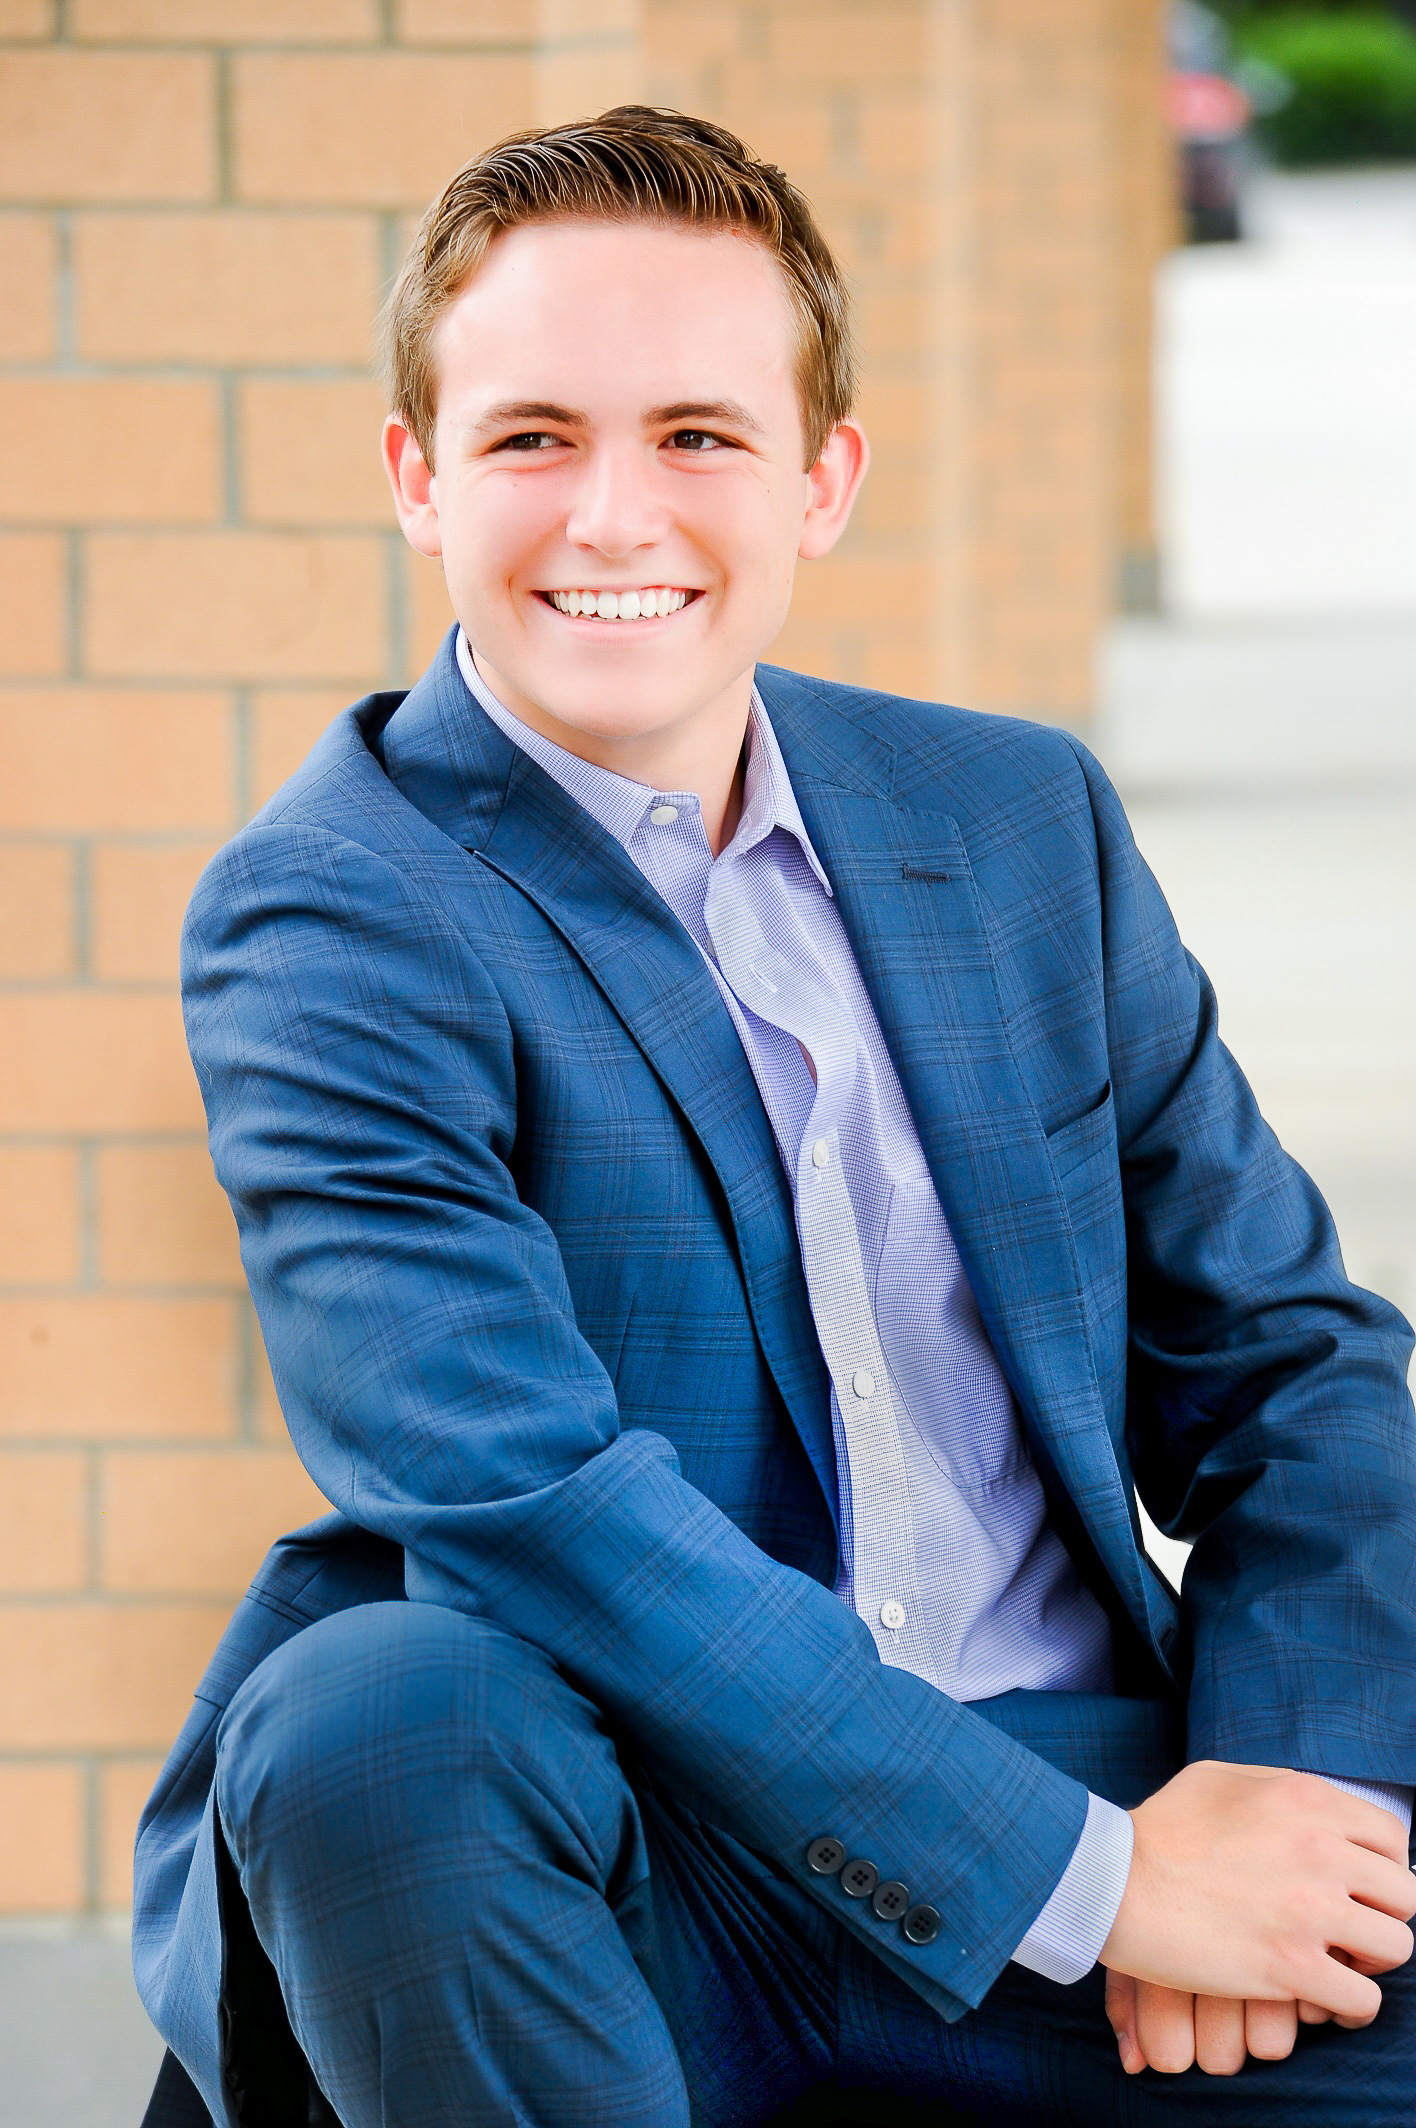 John Wooten Nine Noon Secret Workday Uber-Wealthy Americans Lake Norman Charter School Georgia Tech finance investing